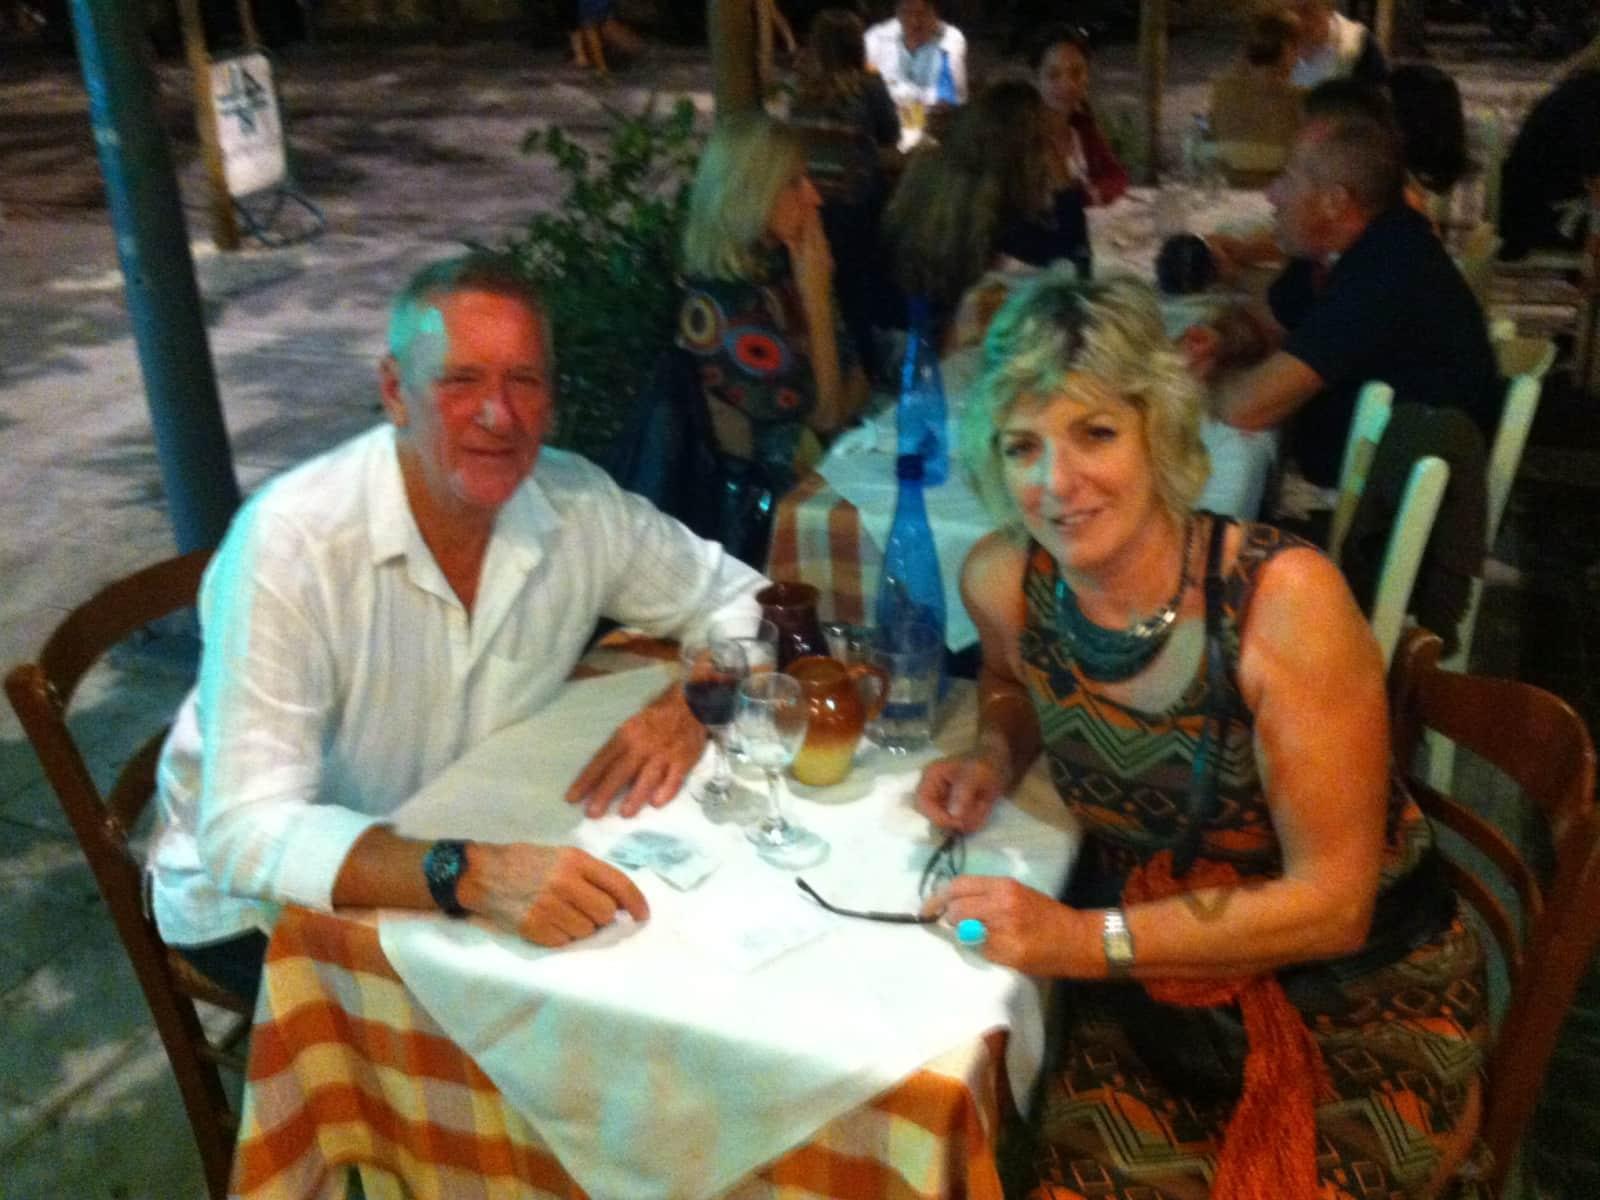 Keith & Amanda from Gold Coast, Queensland, Australia